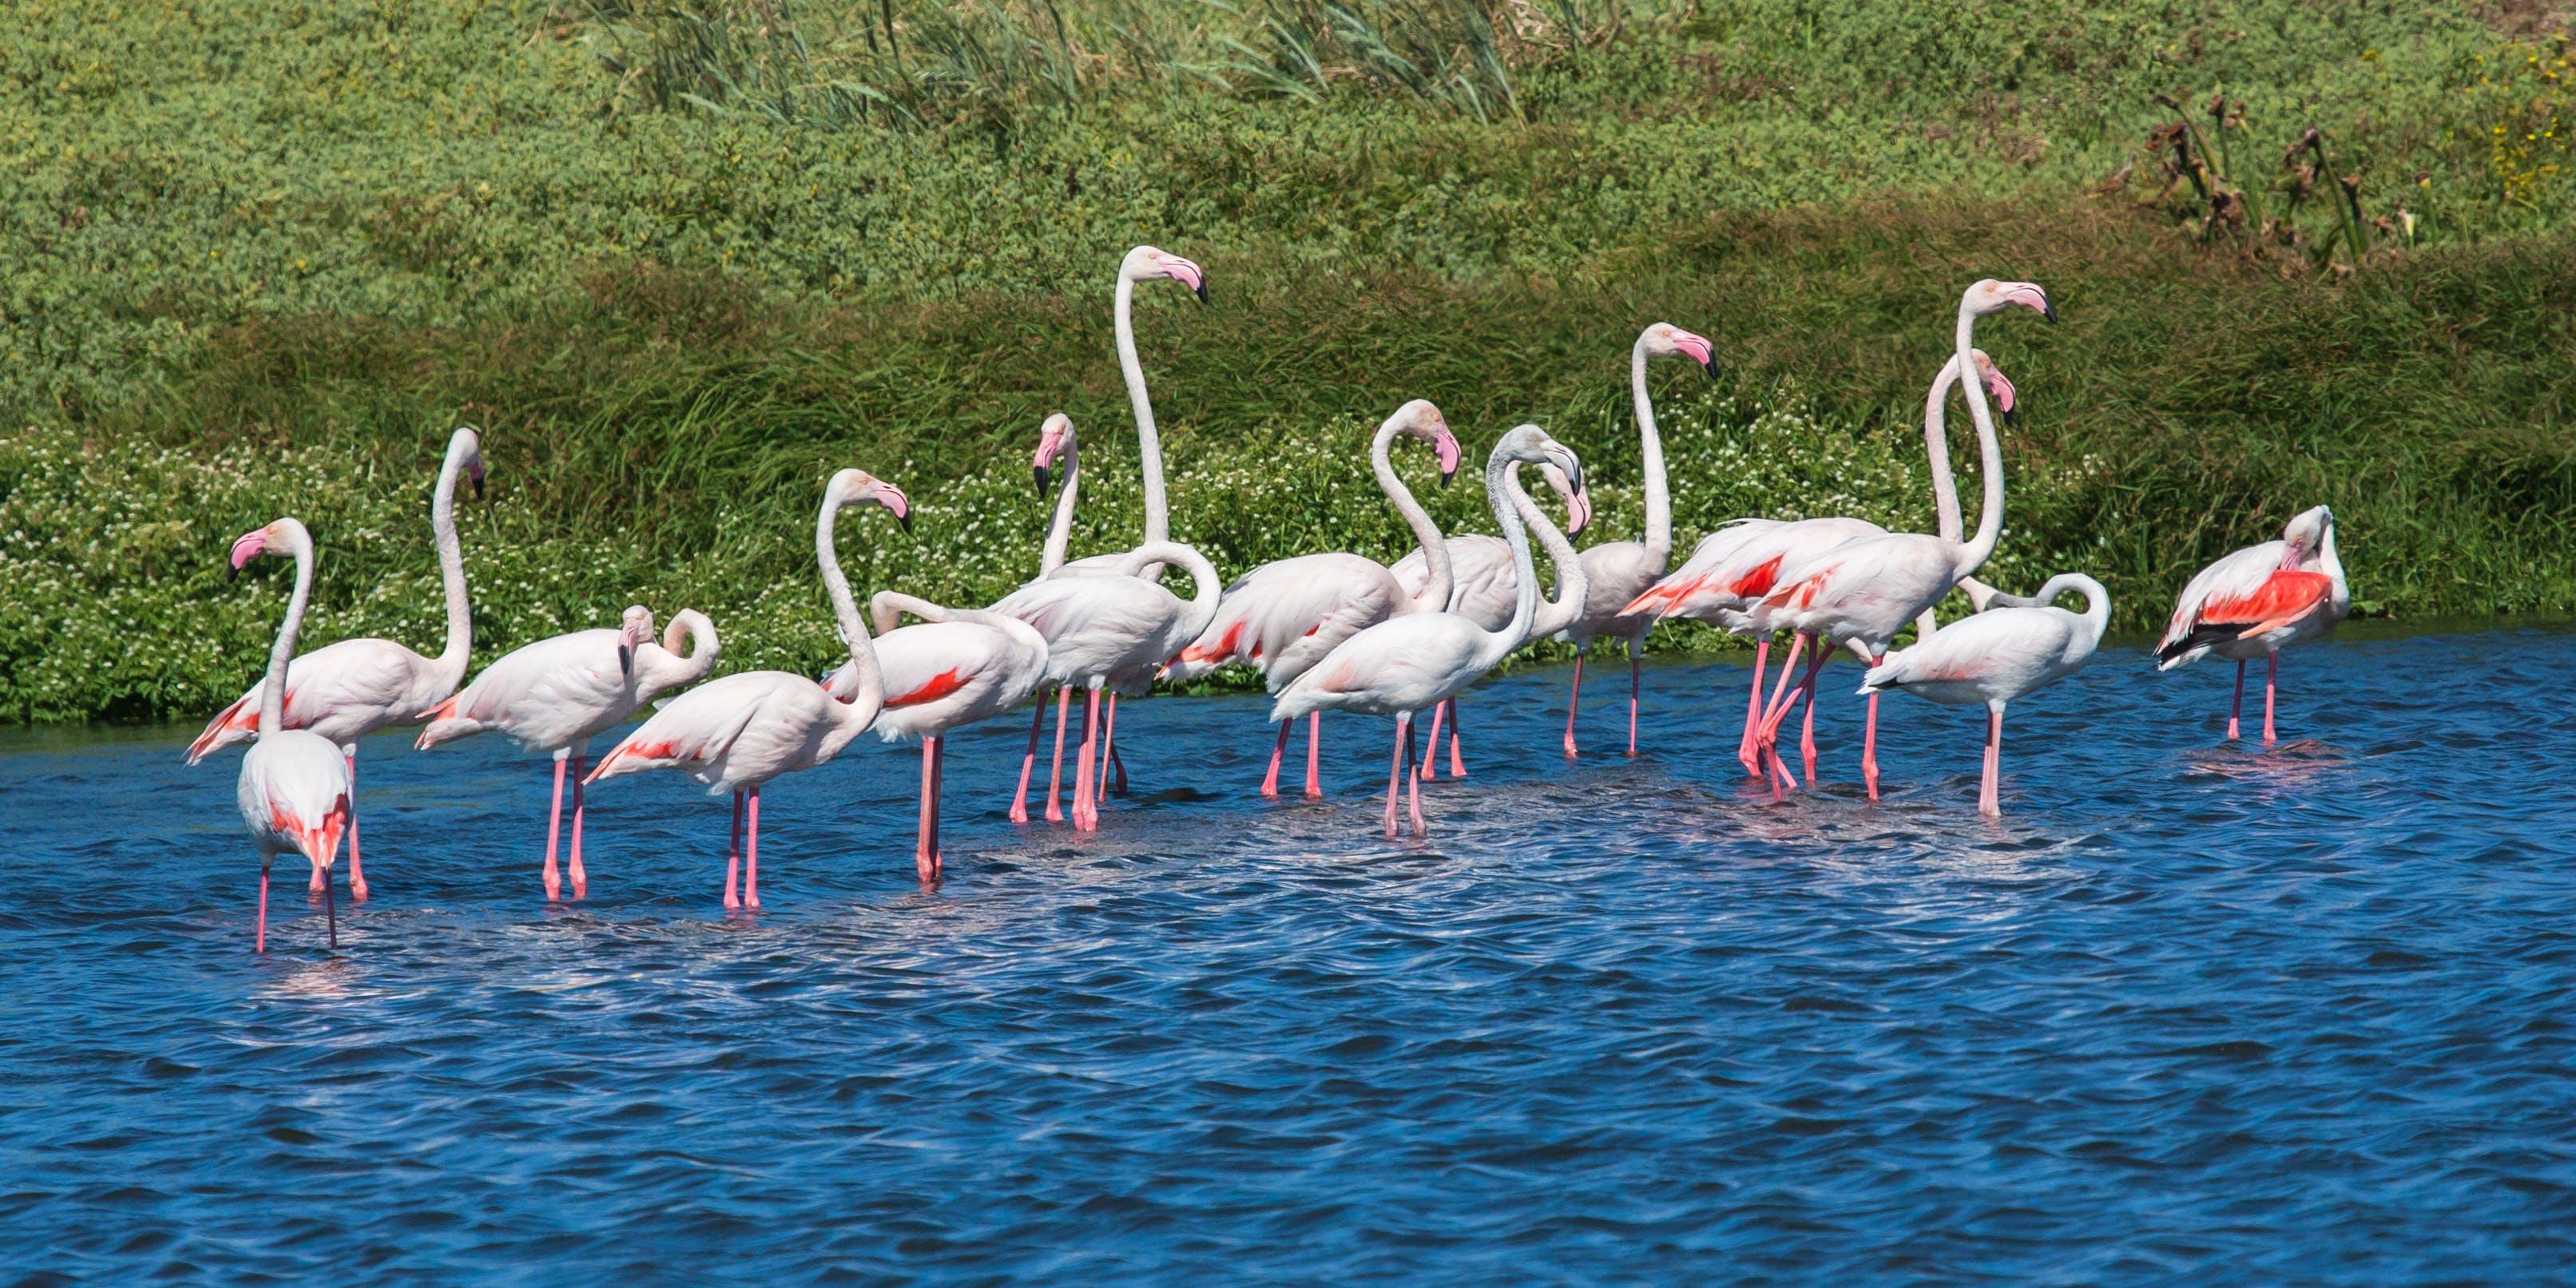 Flock of Flamingos in Body of Water